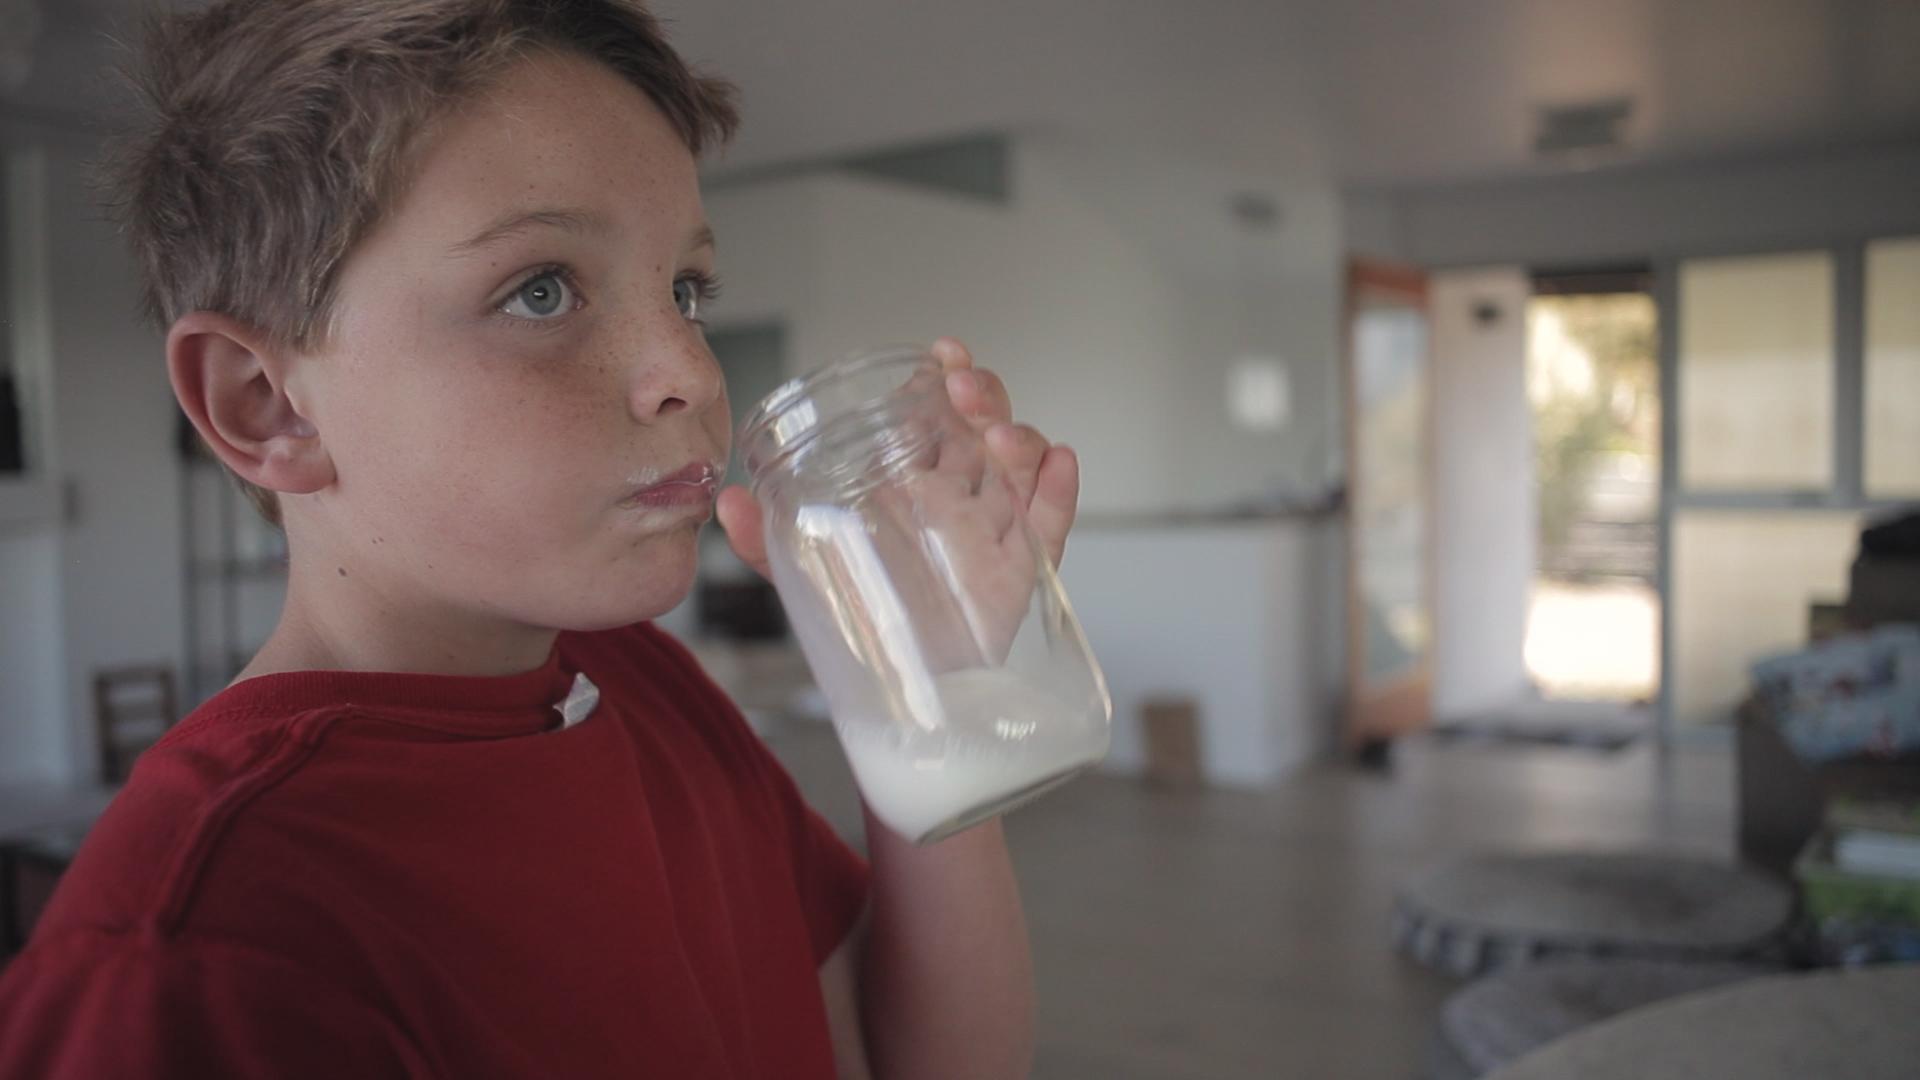 communigift-los angeles-birthday-party-boy-milk-woodwalk-commercial